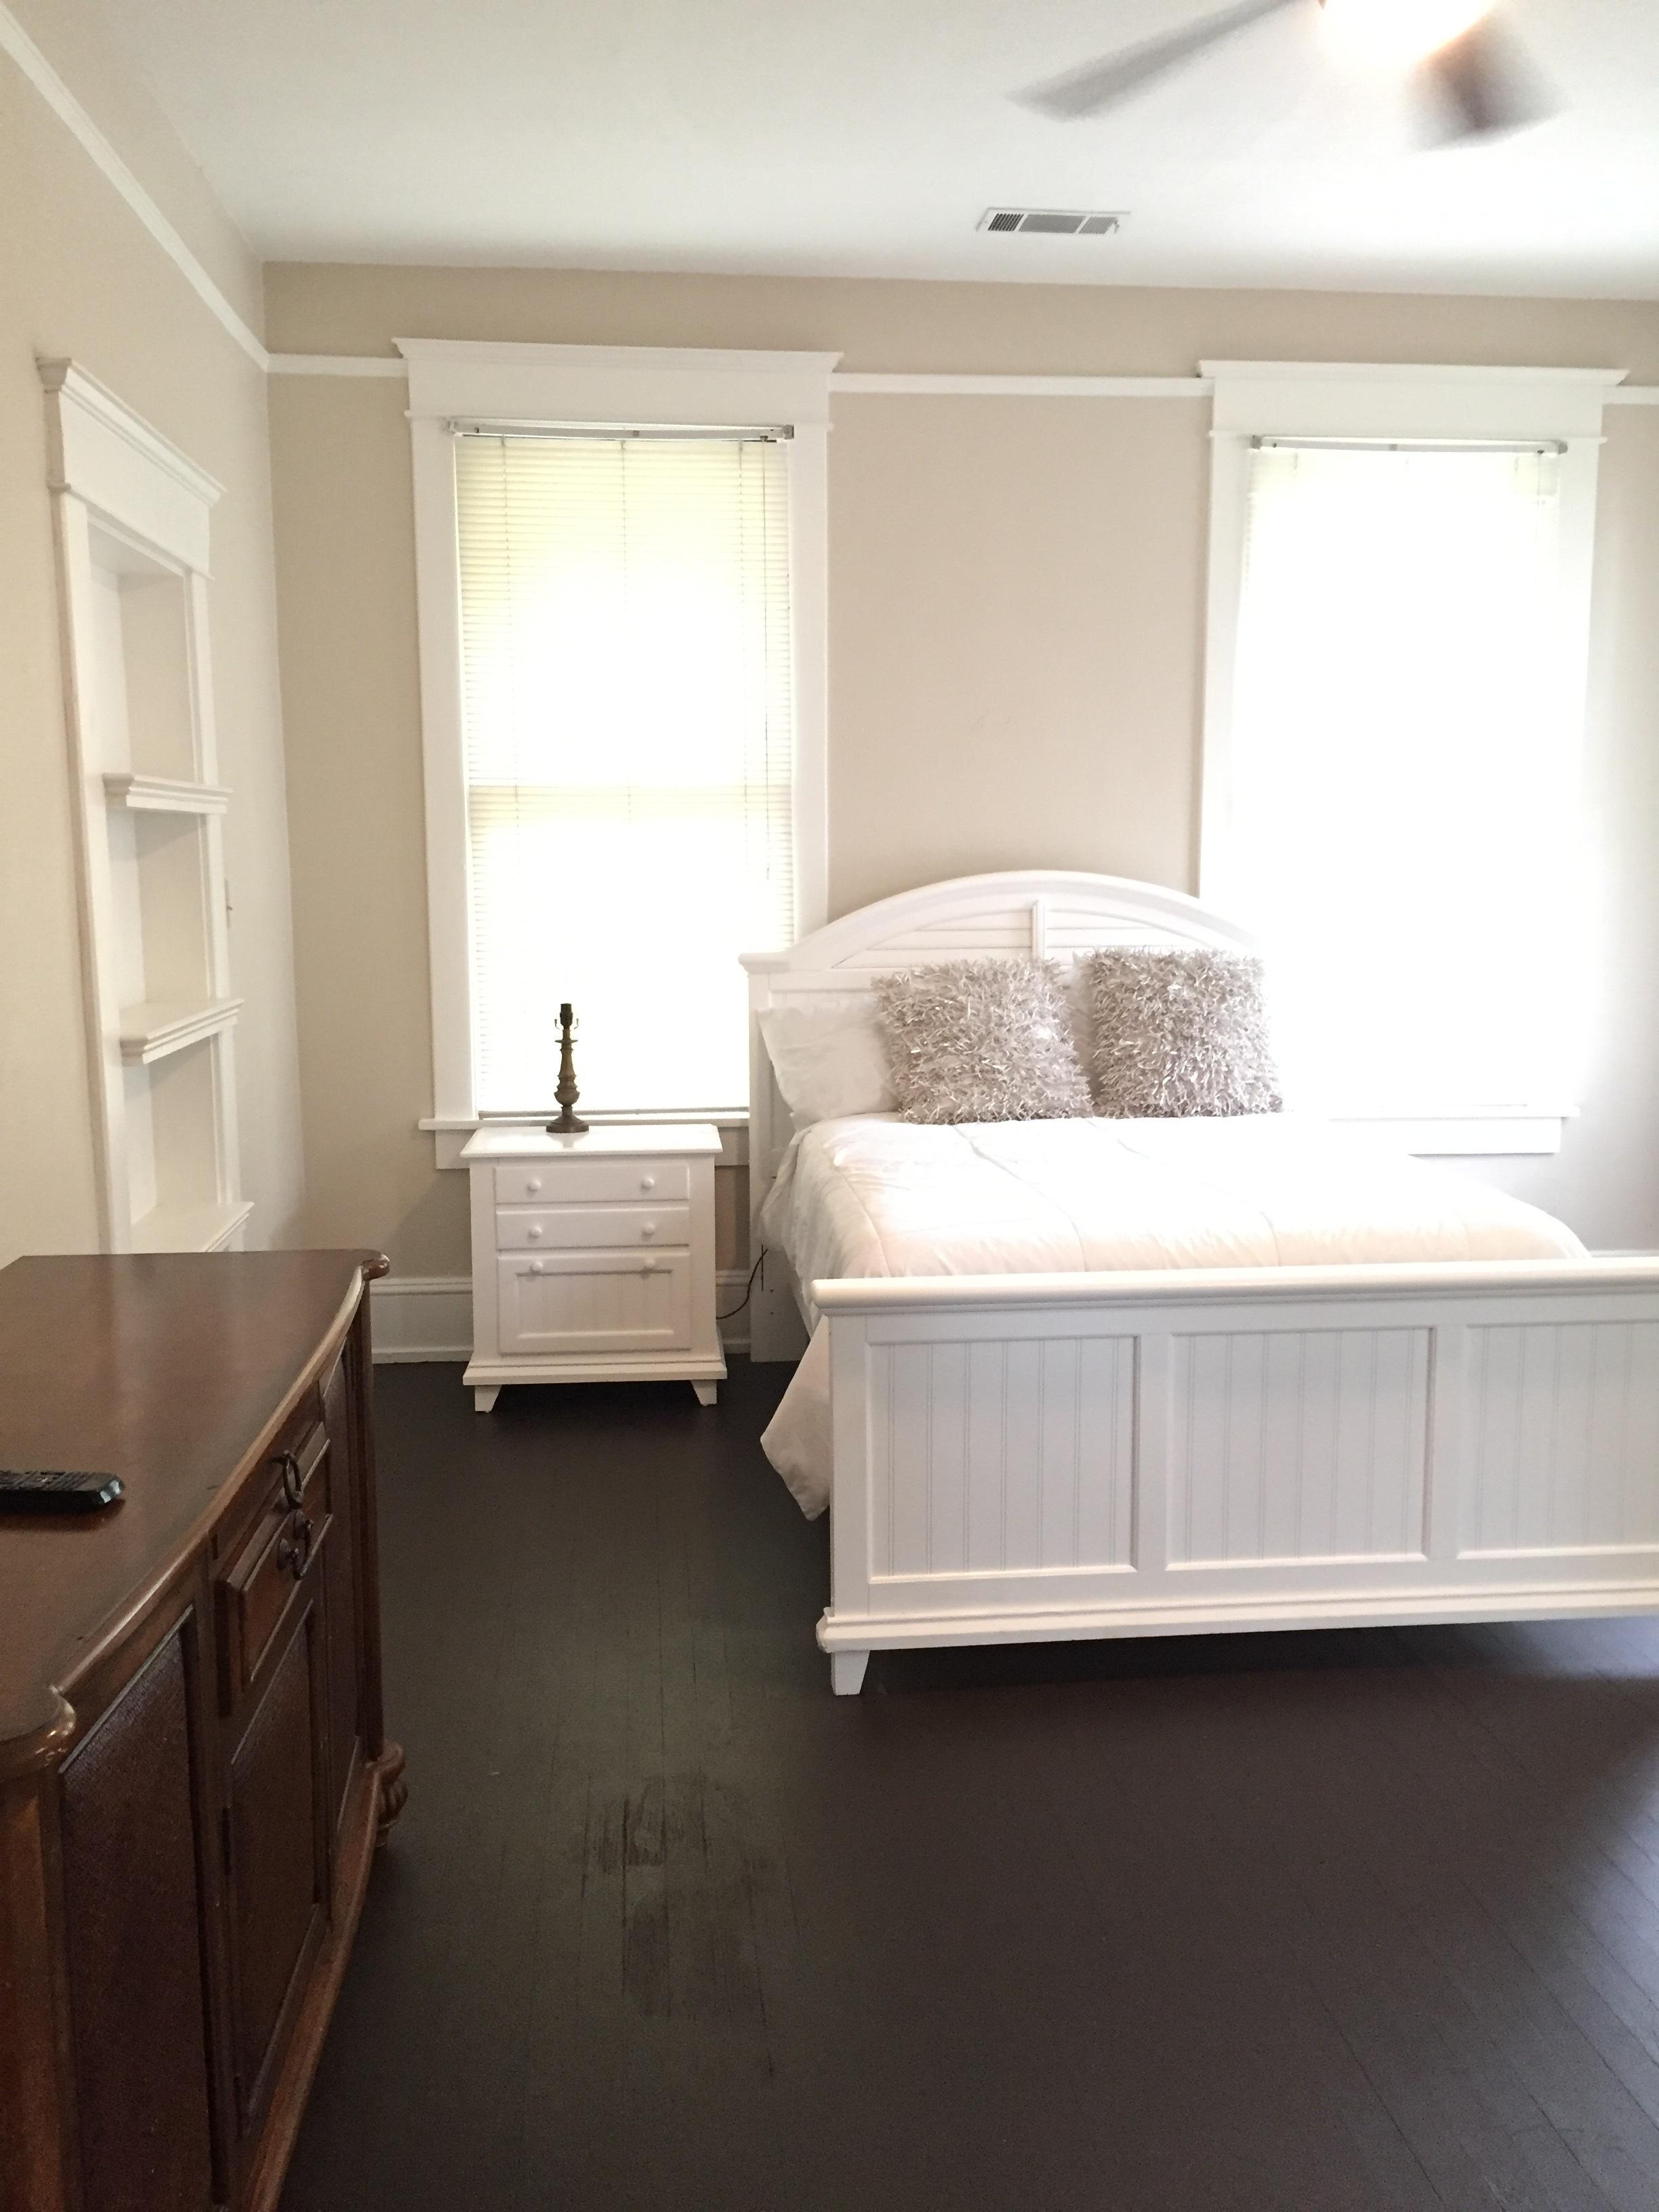 Studio 834 - Sleeps 2 Adults Available on Airbnb